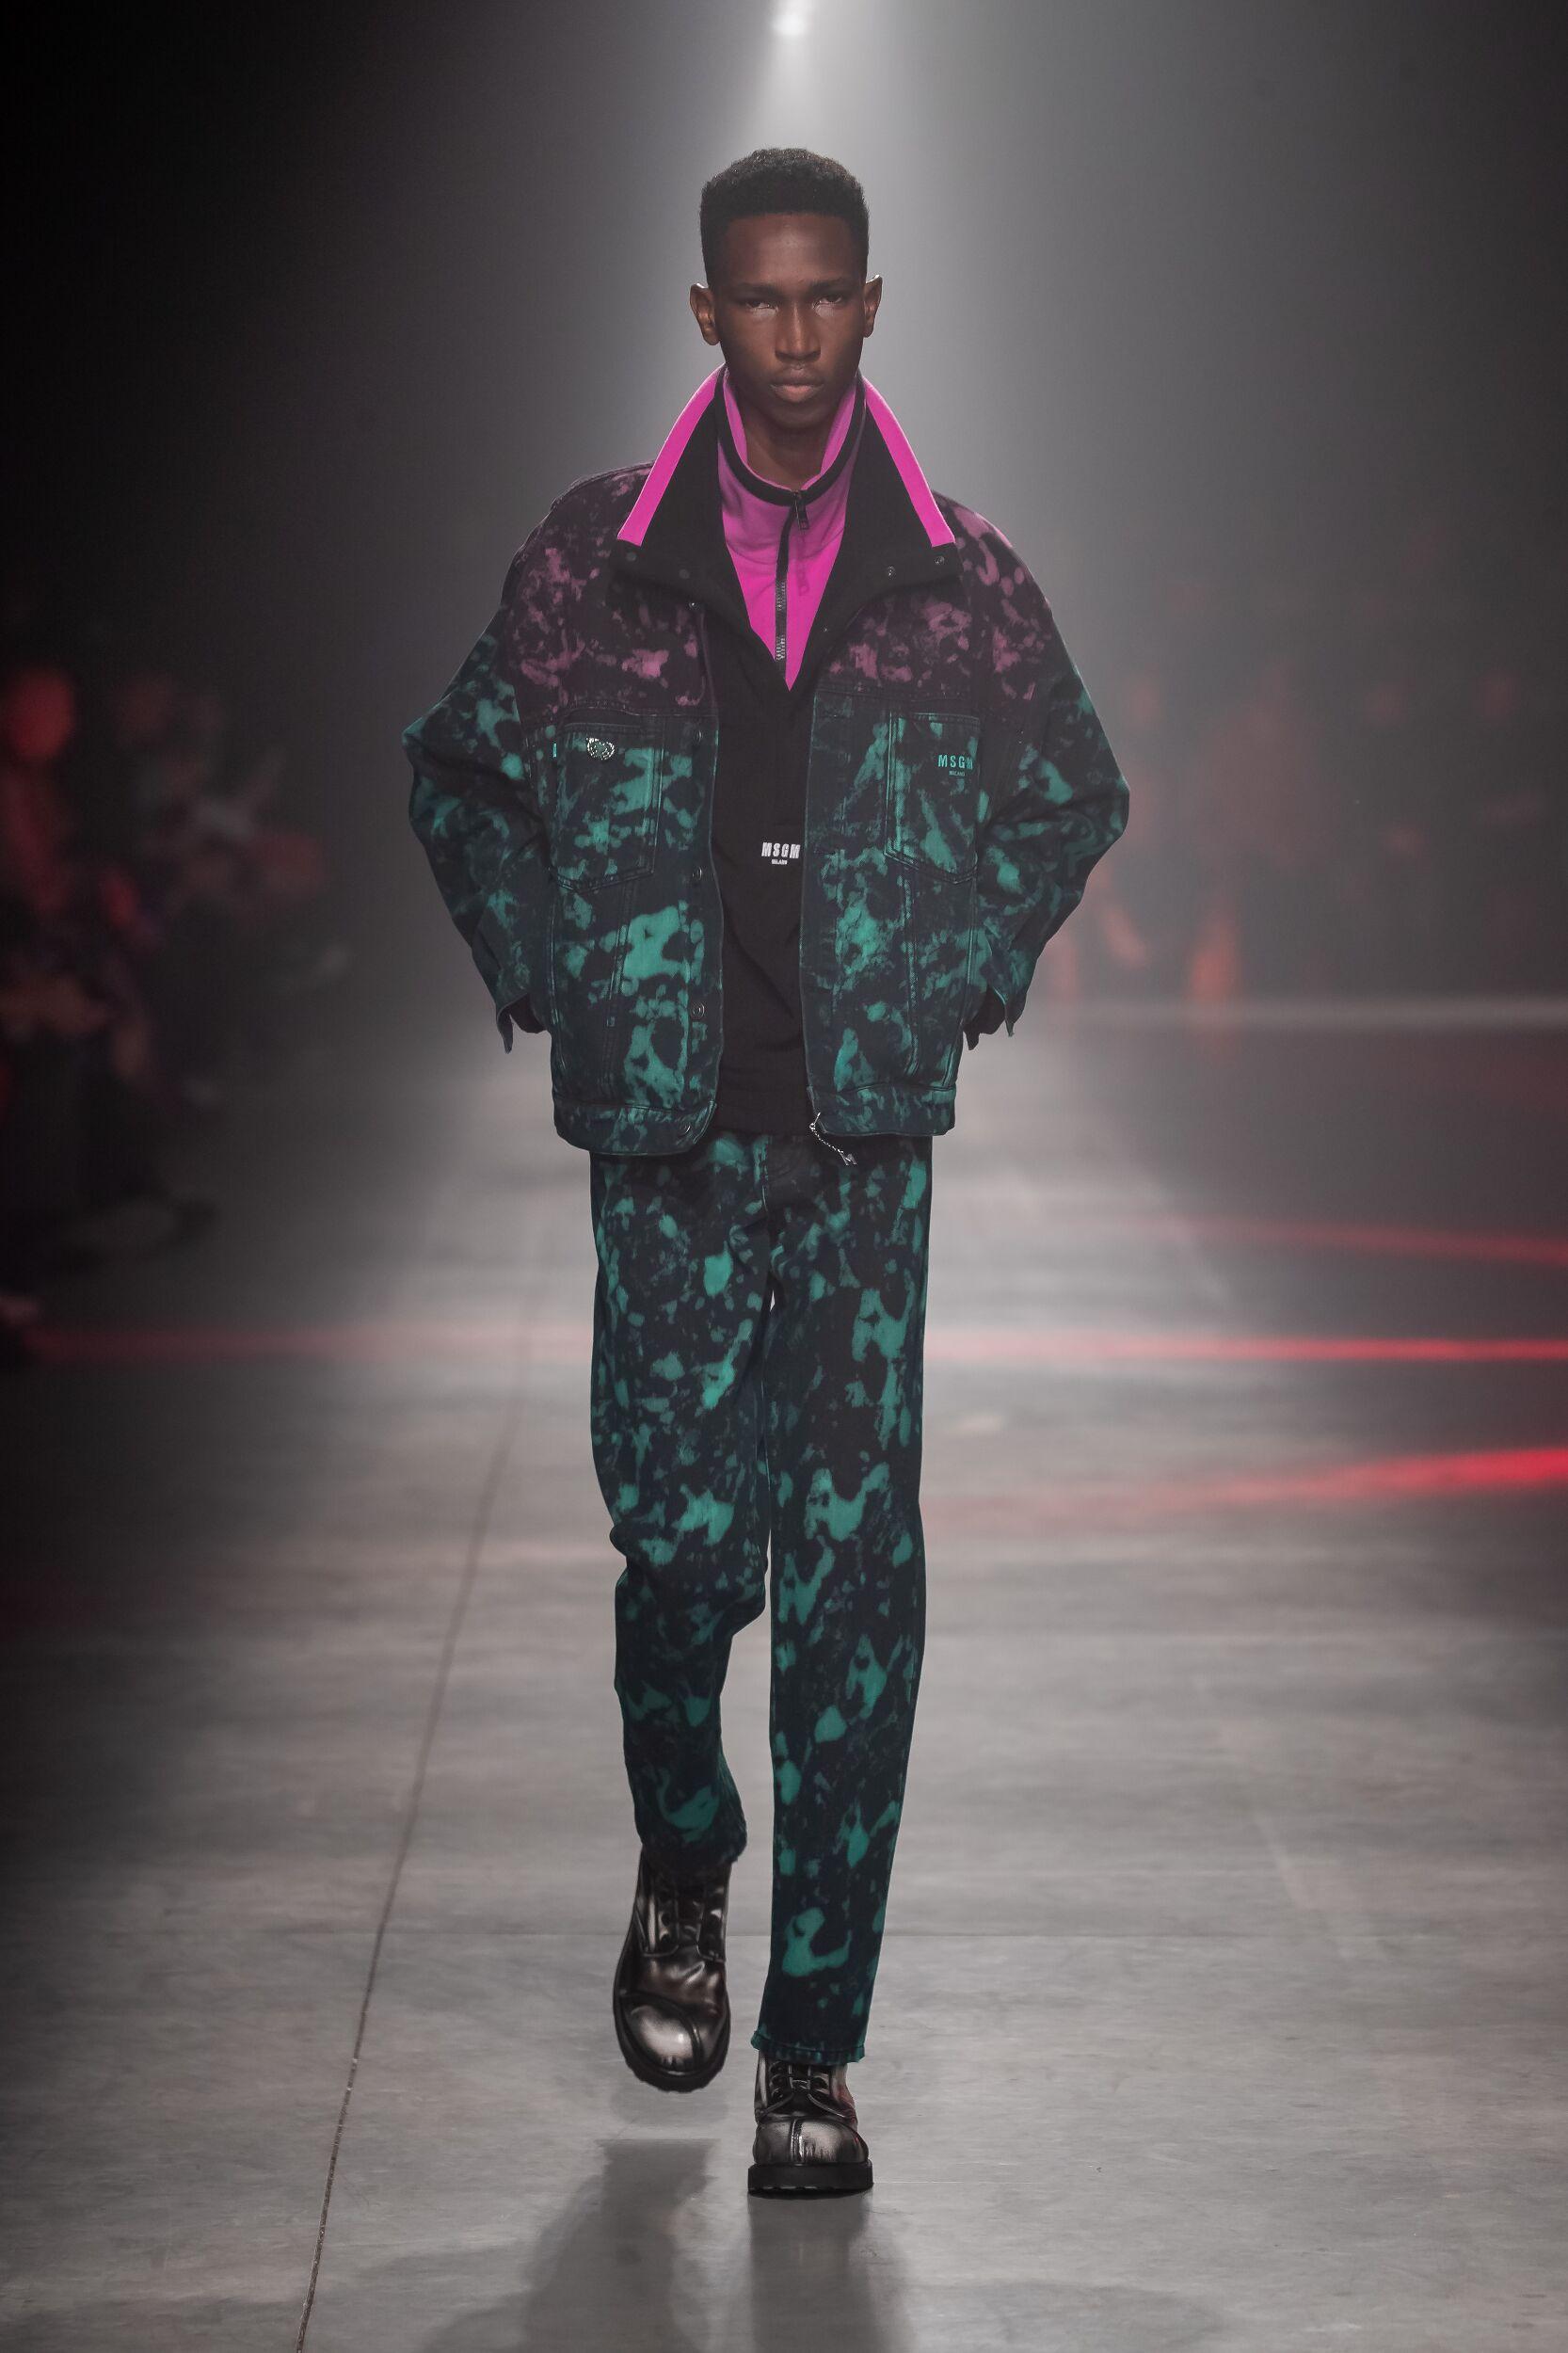 2020 Catwalk MSGM Man Fashion Show Winter